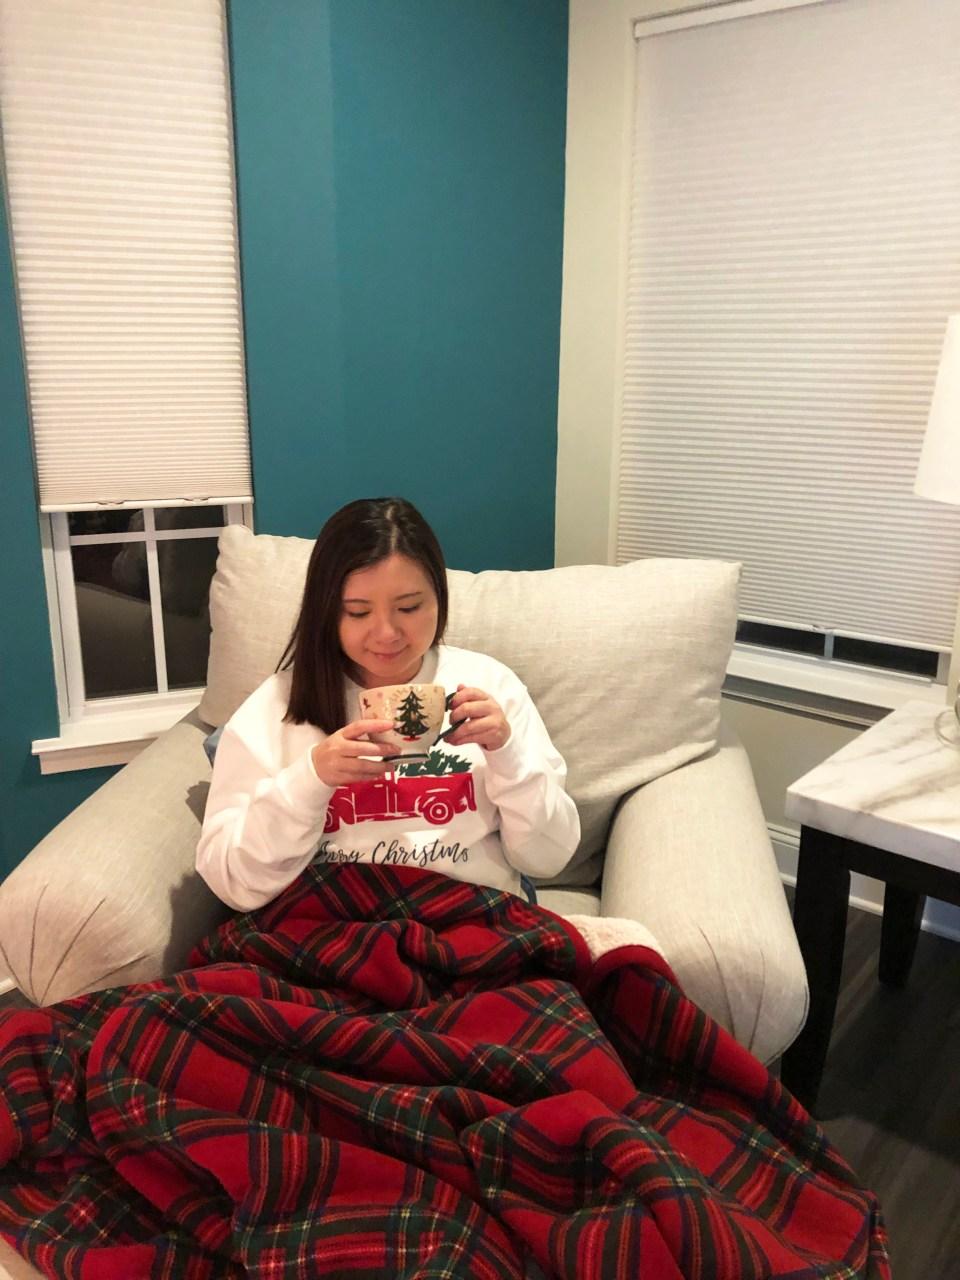 Christmas Tree Truck Sweatshirt + Plaid Sherpa Blanket 7